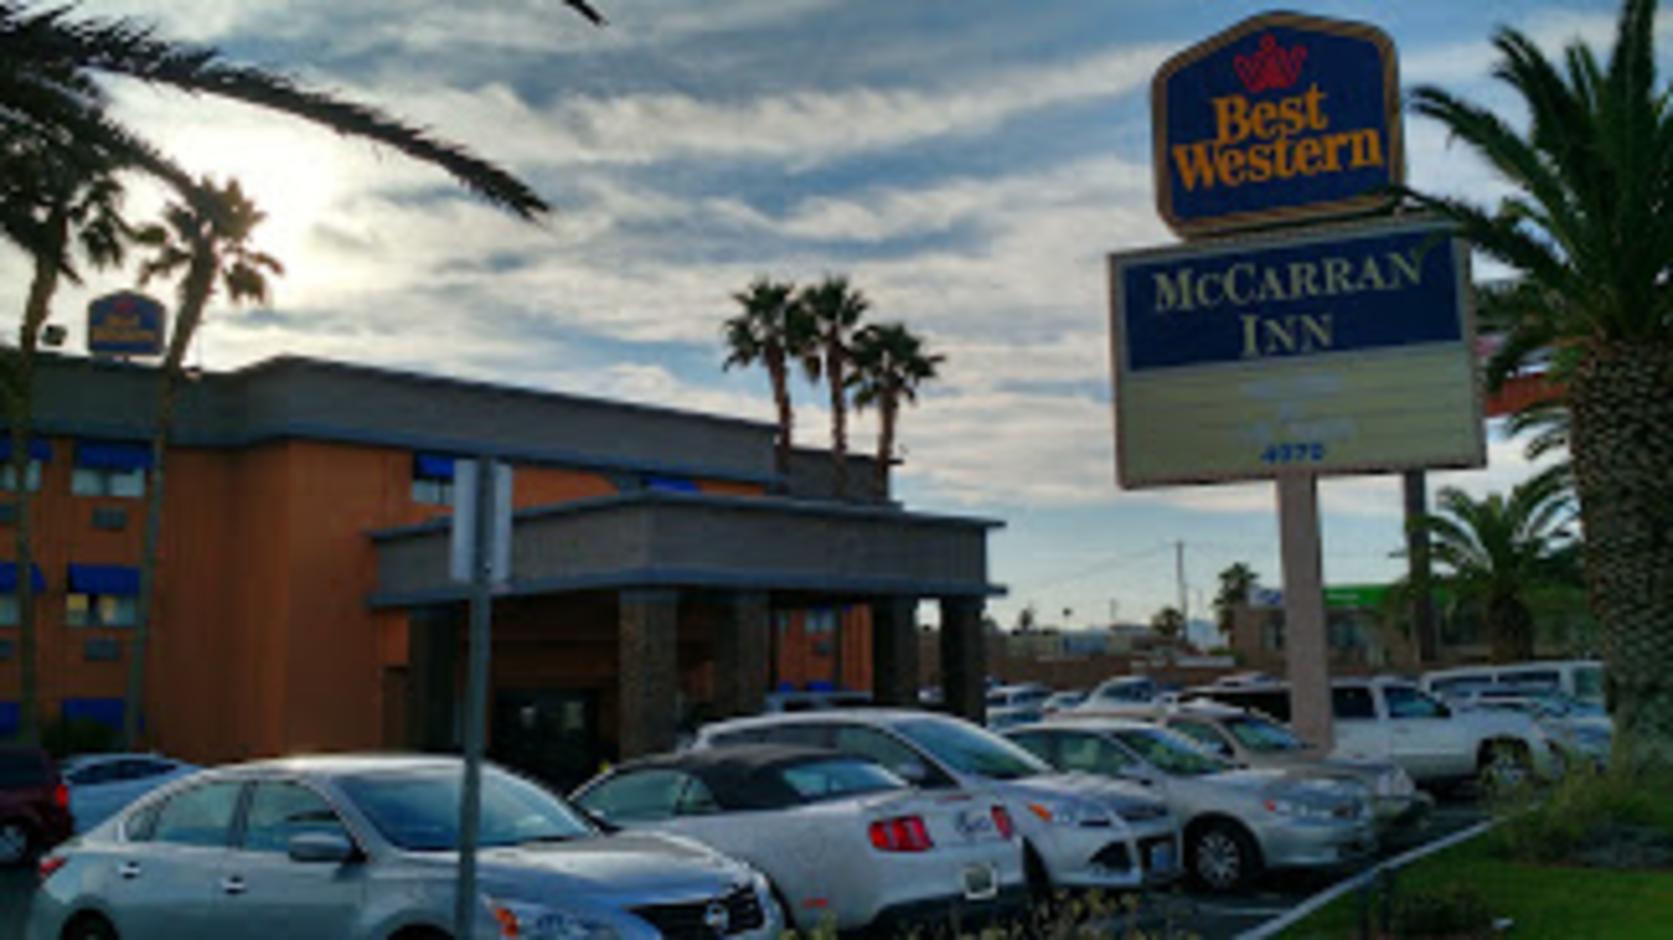 PARK, SLEEP & FLY Best Western McCarran Inn (King Bedroom) *NO SHUTTLE*